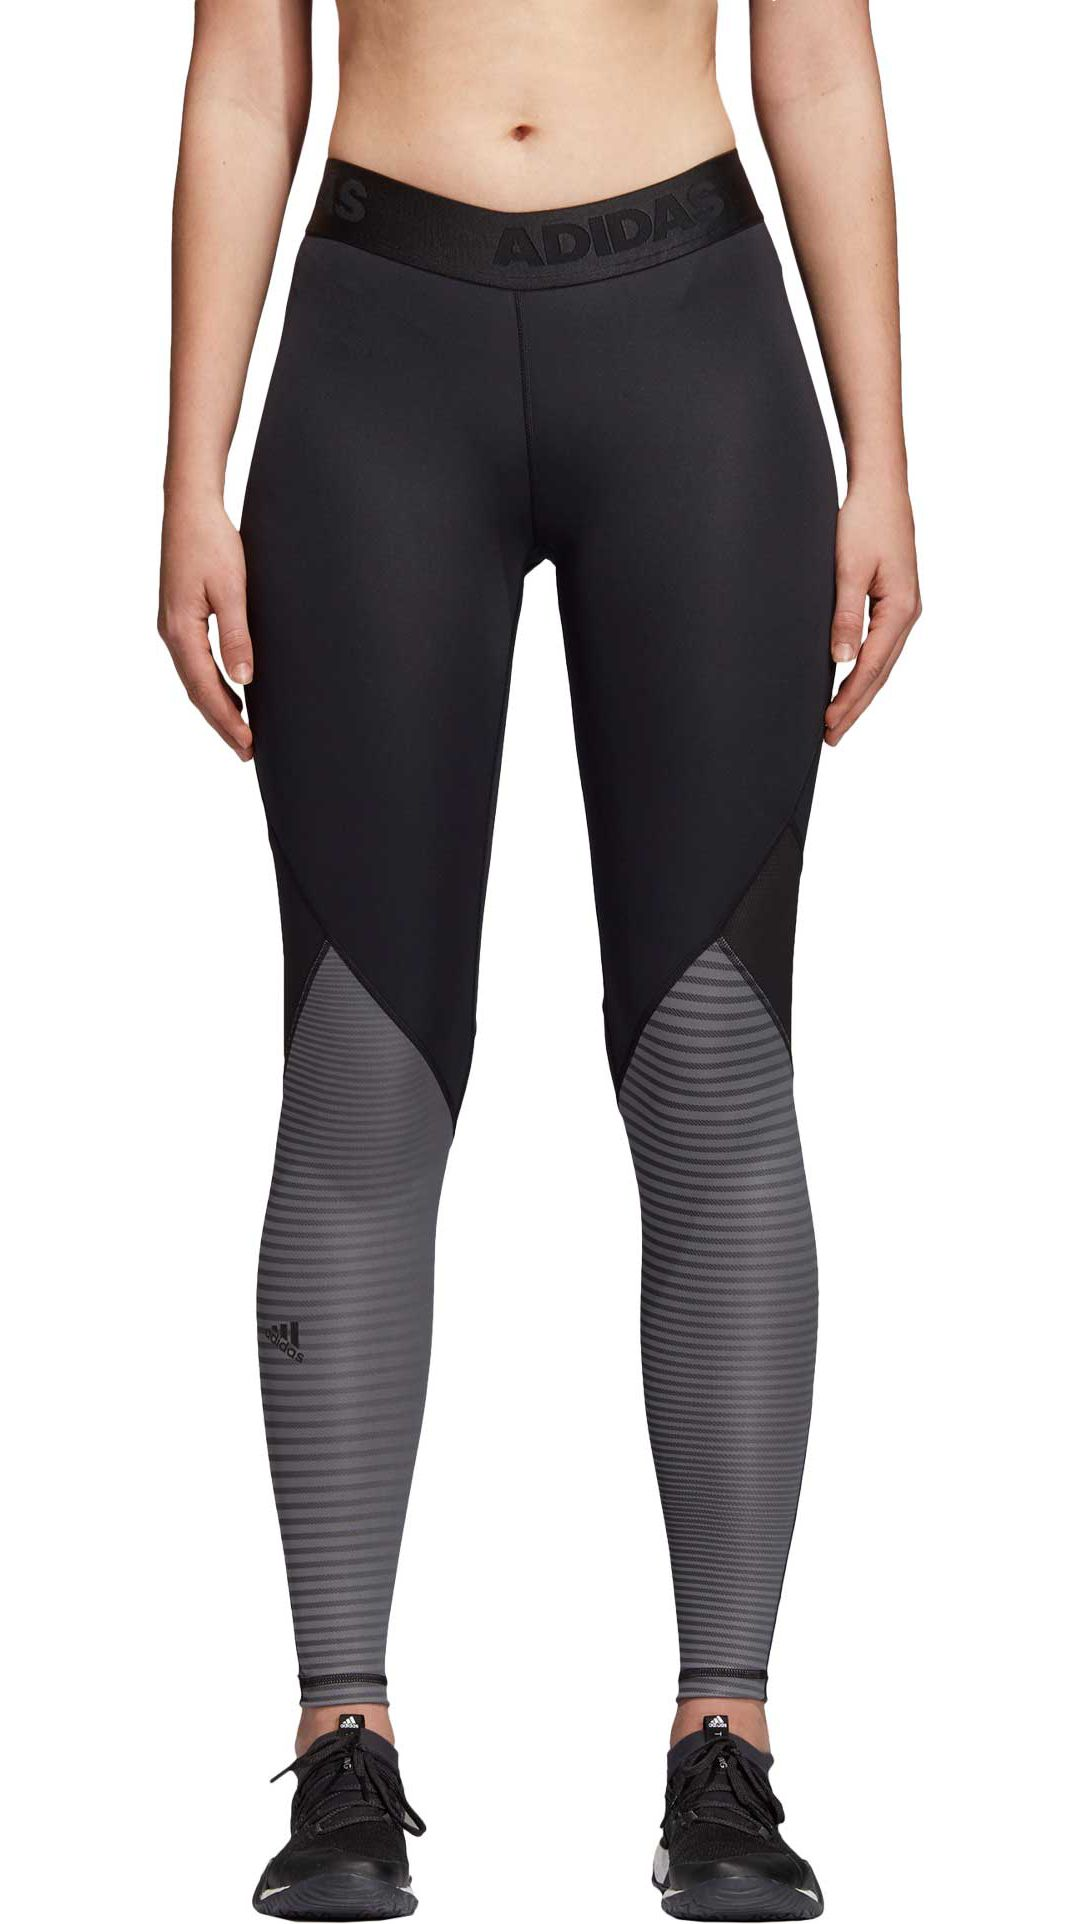 61eae9a99b7 adidas Women s Alphaskin Sport Long Printed Tights 1